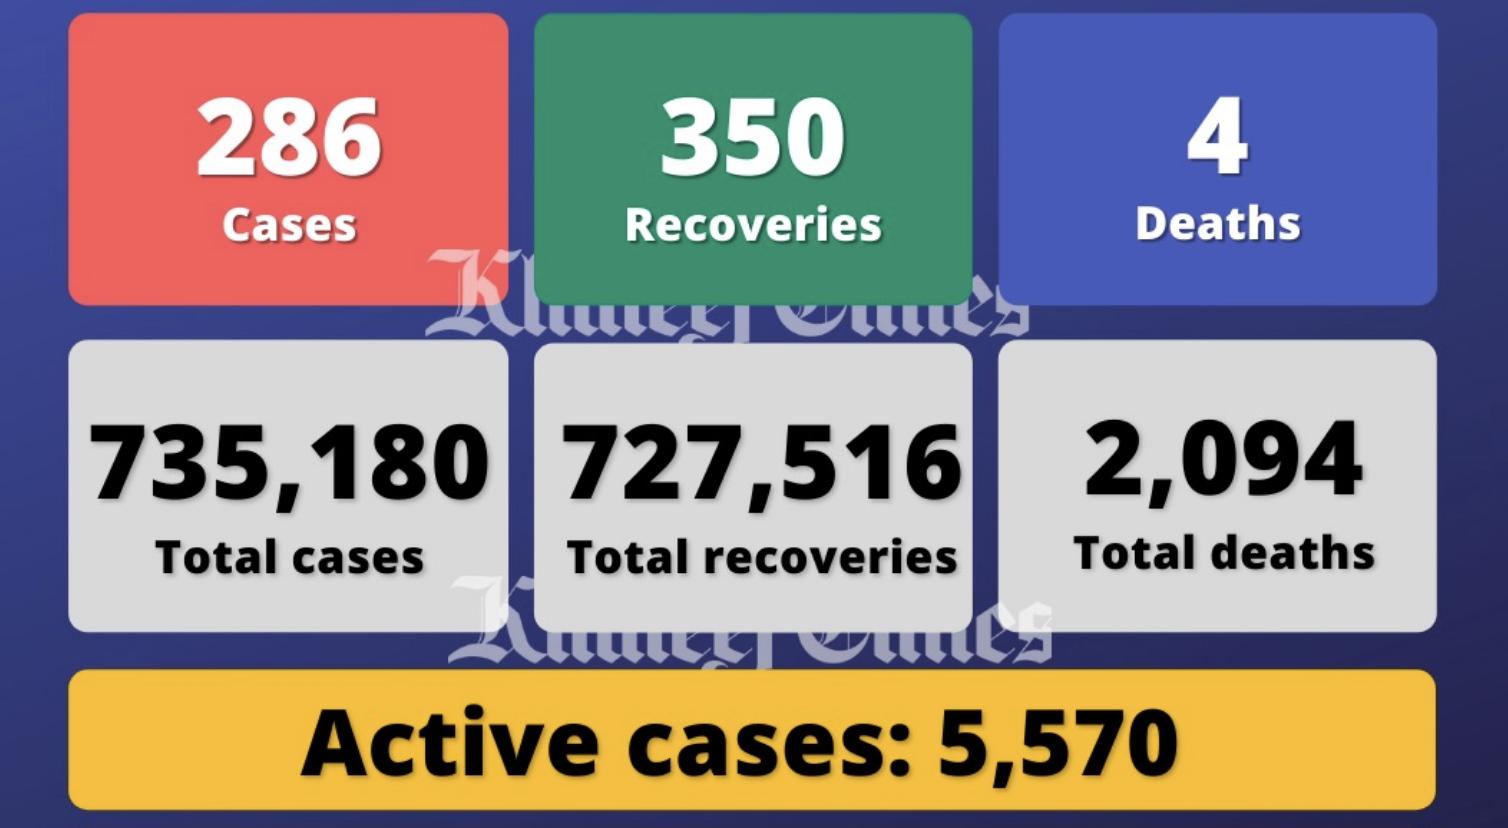 Coronavirus: UAE reports 286 Covid-19 cases, 350 recoveries, 4 deaths